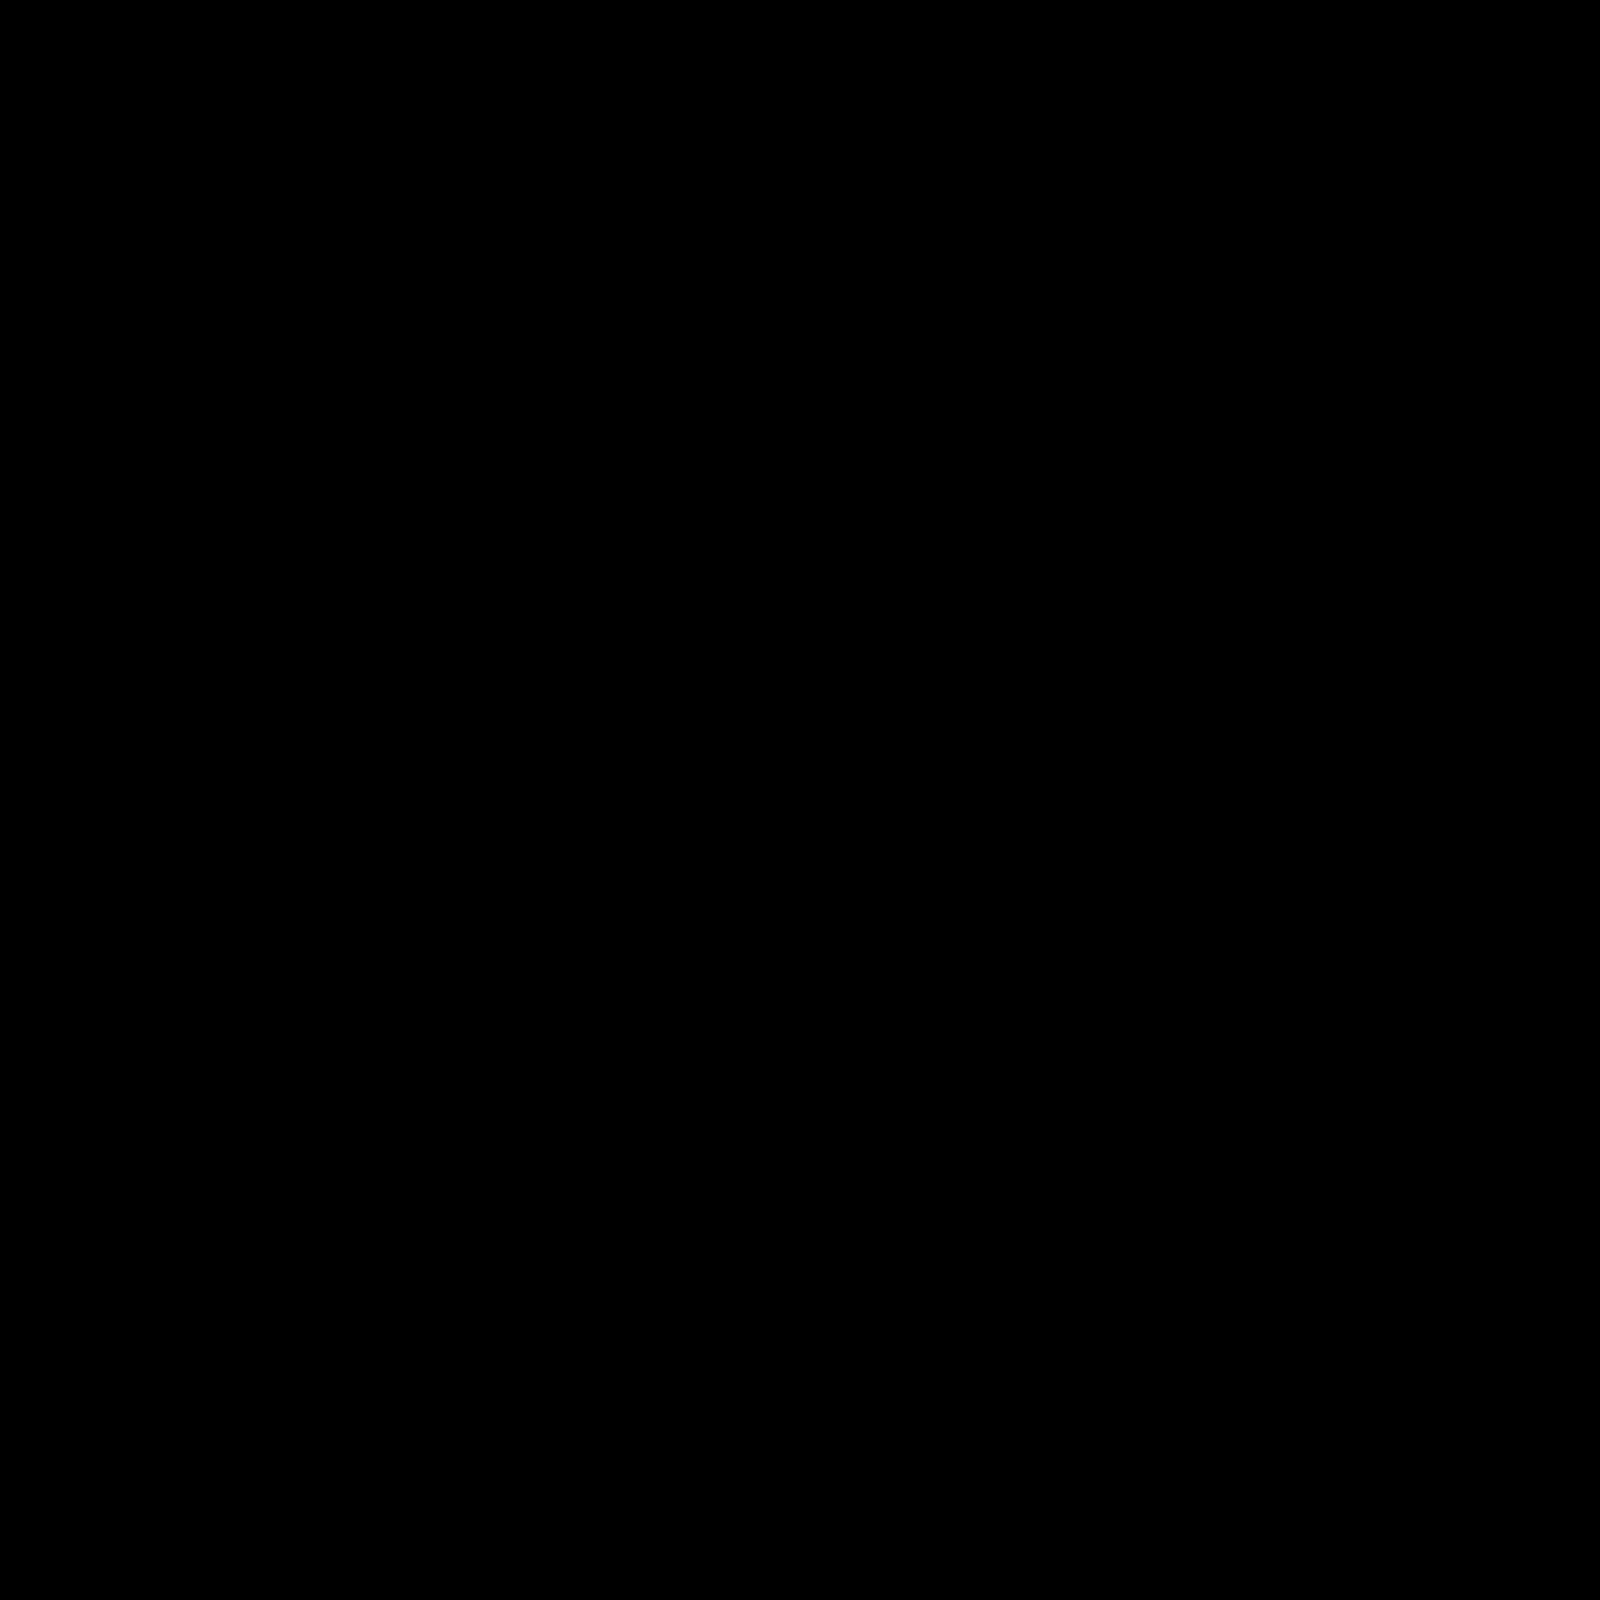 Bathroom Sound Filled icon